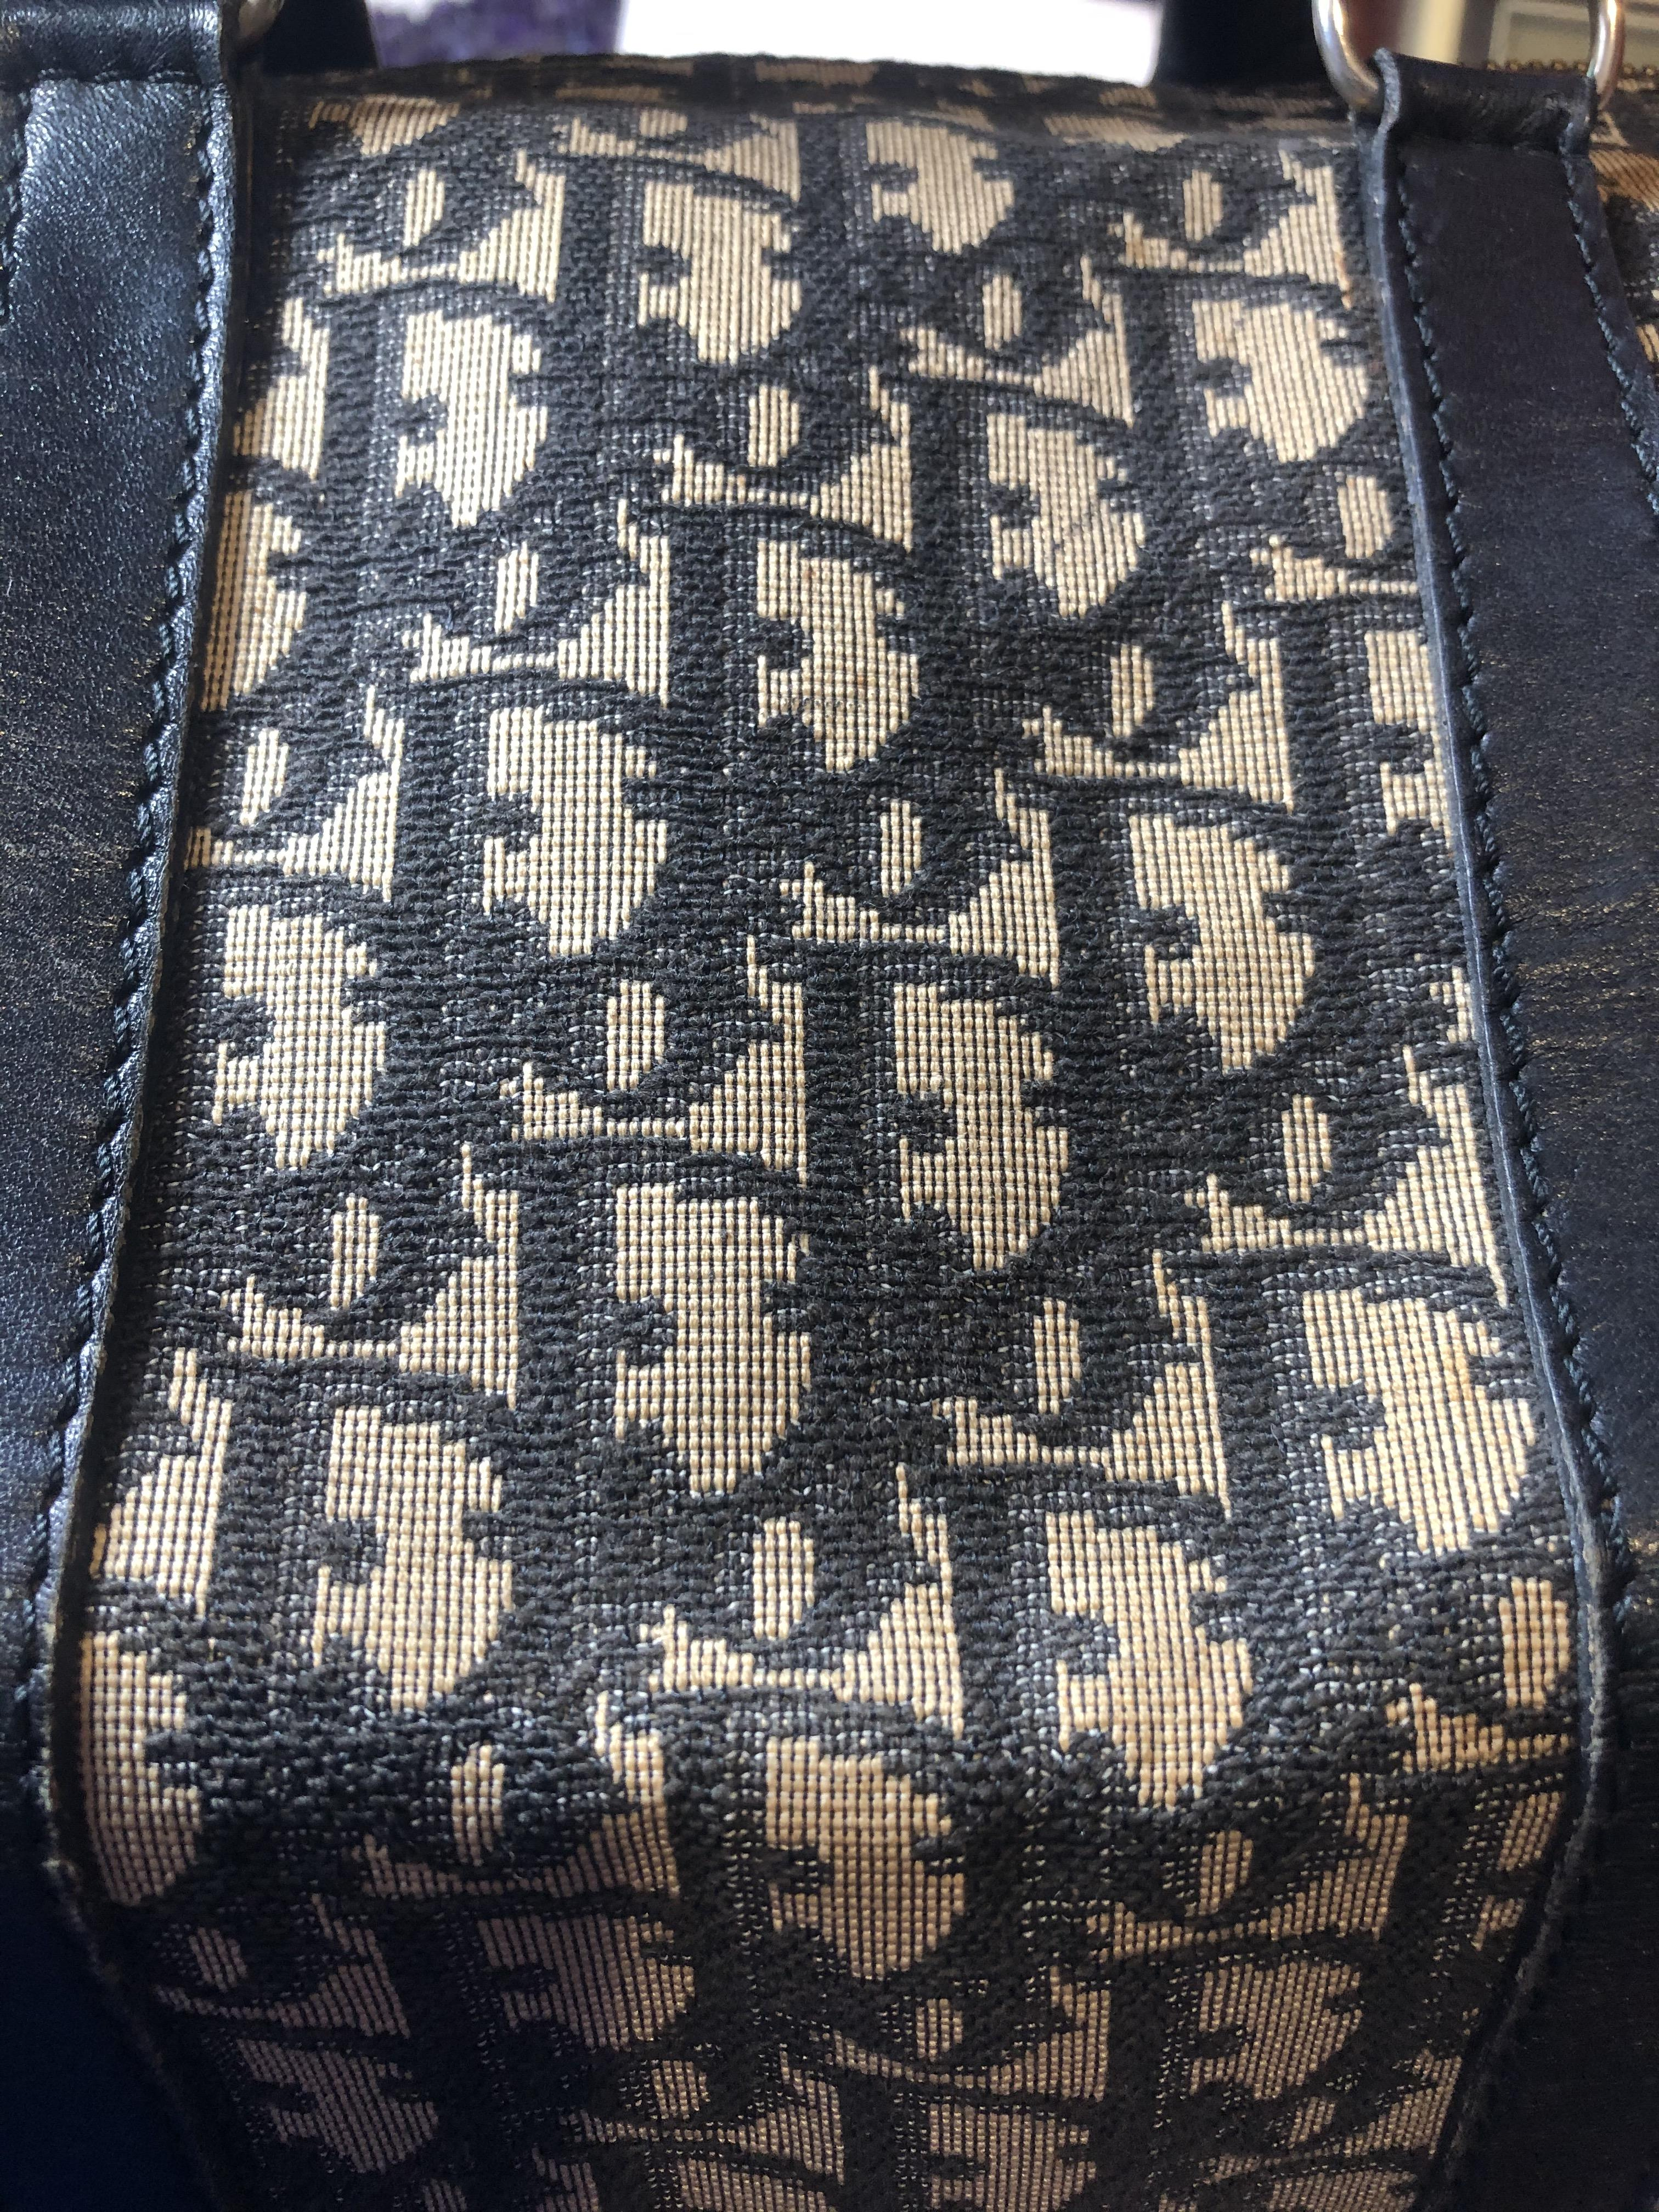 A Dior Vintage Small Boston Handbag, - Image 4 of 5